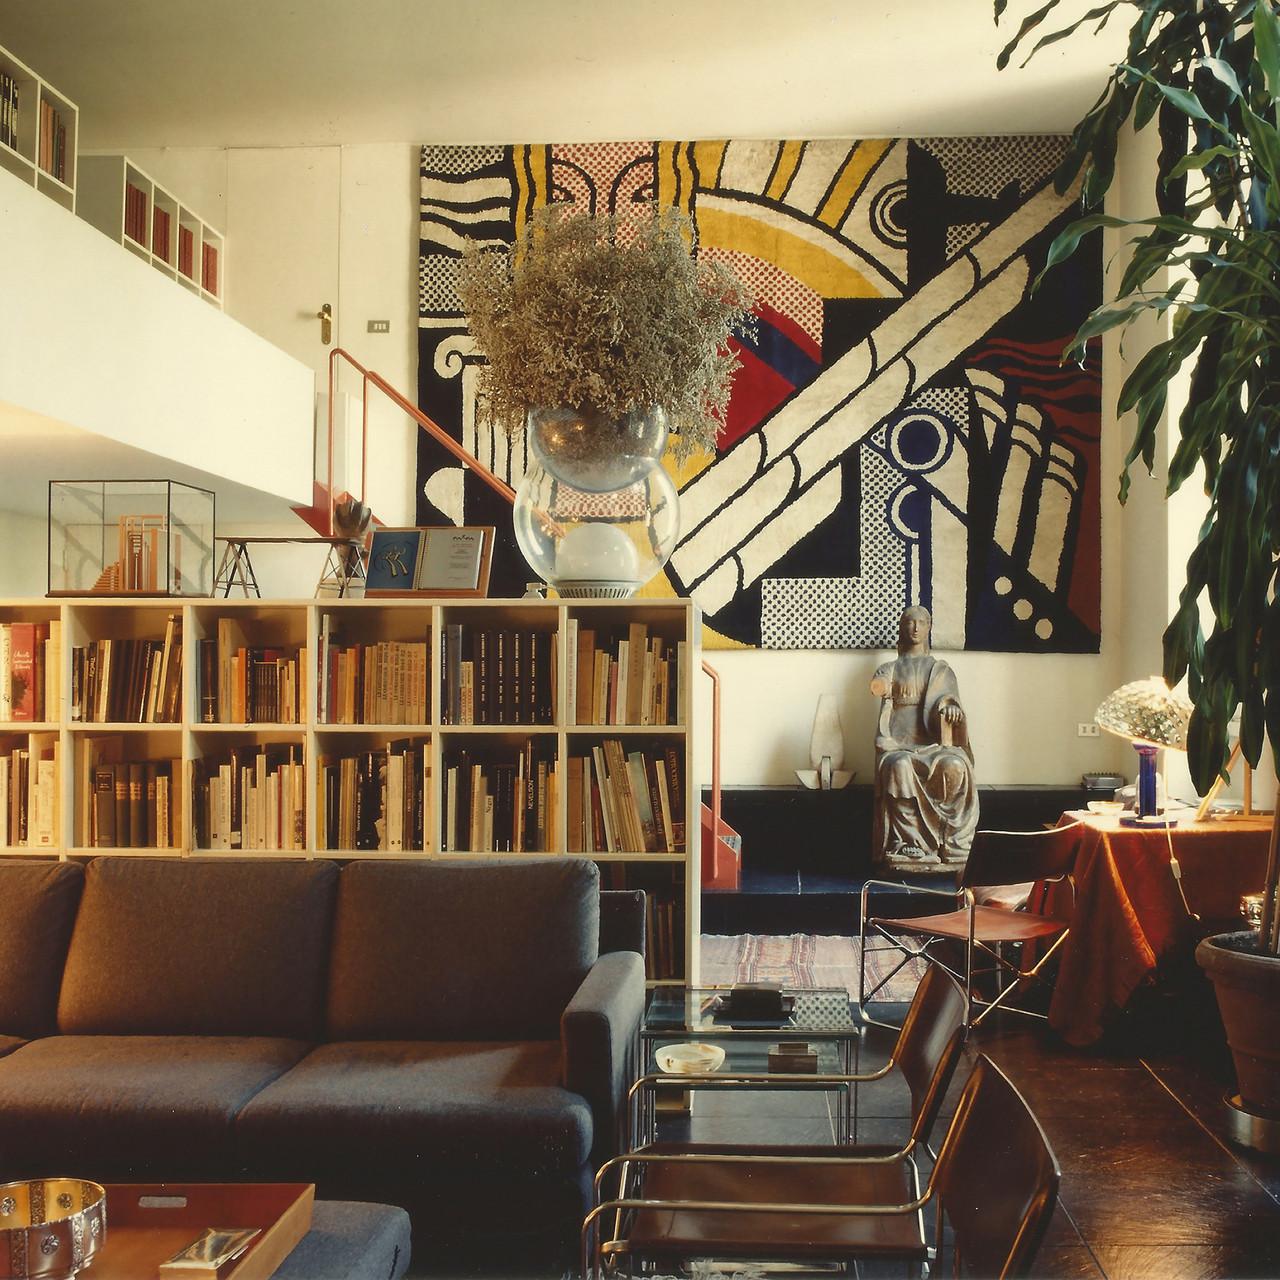 Gae Aulentis Wohnung an der Via Fiori Oscuri, Mailand, 1993 Mit freundlicher Genehmigung von Archivio Gae Aulenti, Foto: © Santi Caleca